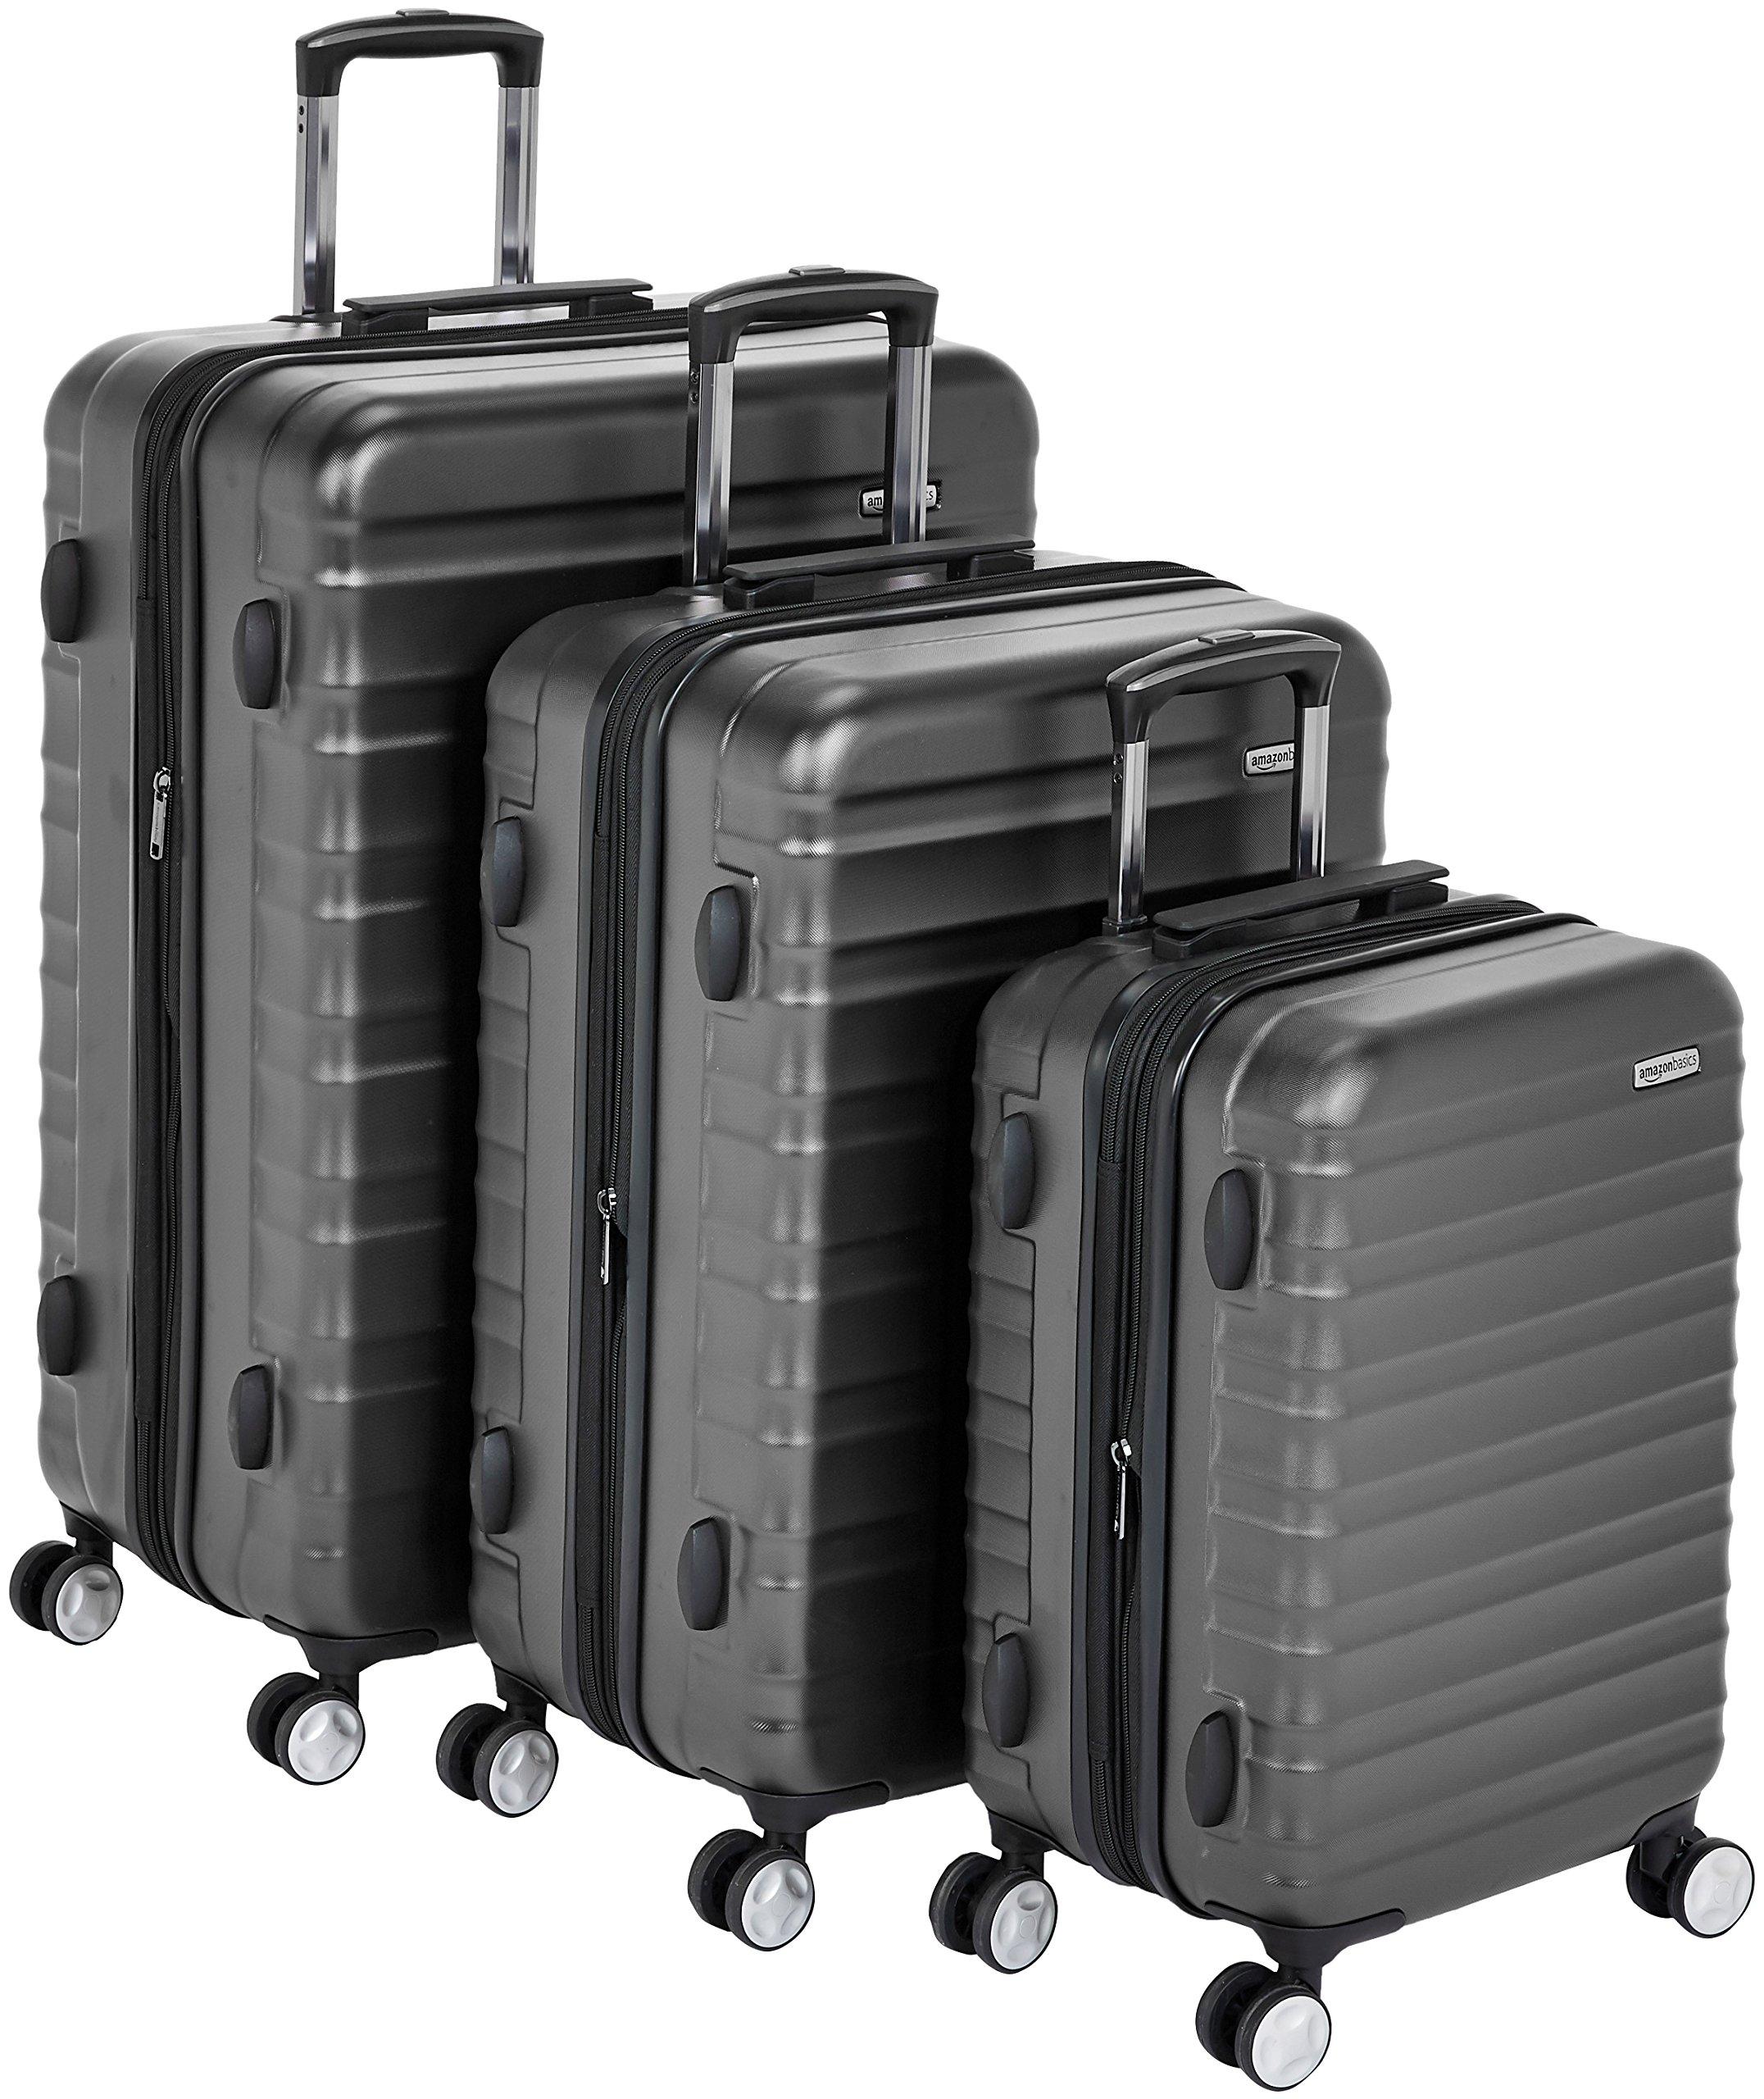 AmazonBasics Premium Hardside Spinner Luggage with Built-In TSA Lock - 3-Piece Set (20'', 24'', 28''), Black by AmazonBasics